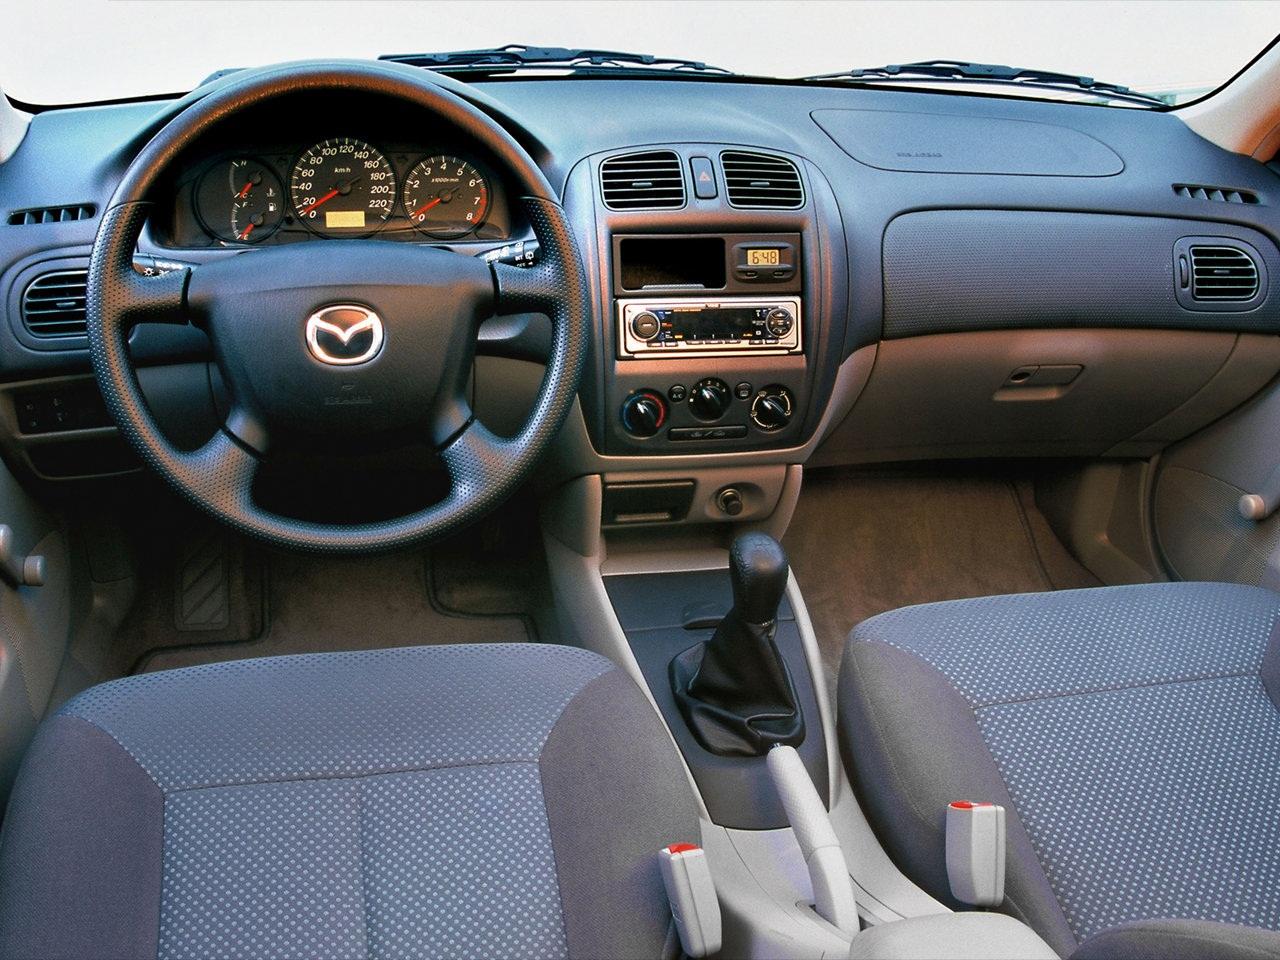 Mazda 323 VI (BJ) Restyling 2000 - 2003 Hatchback 5 door #1